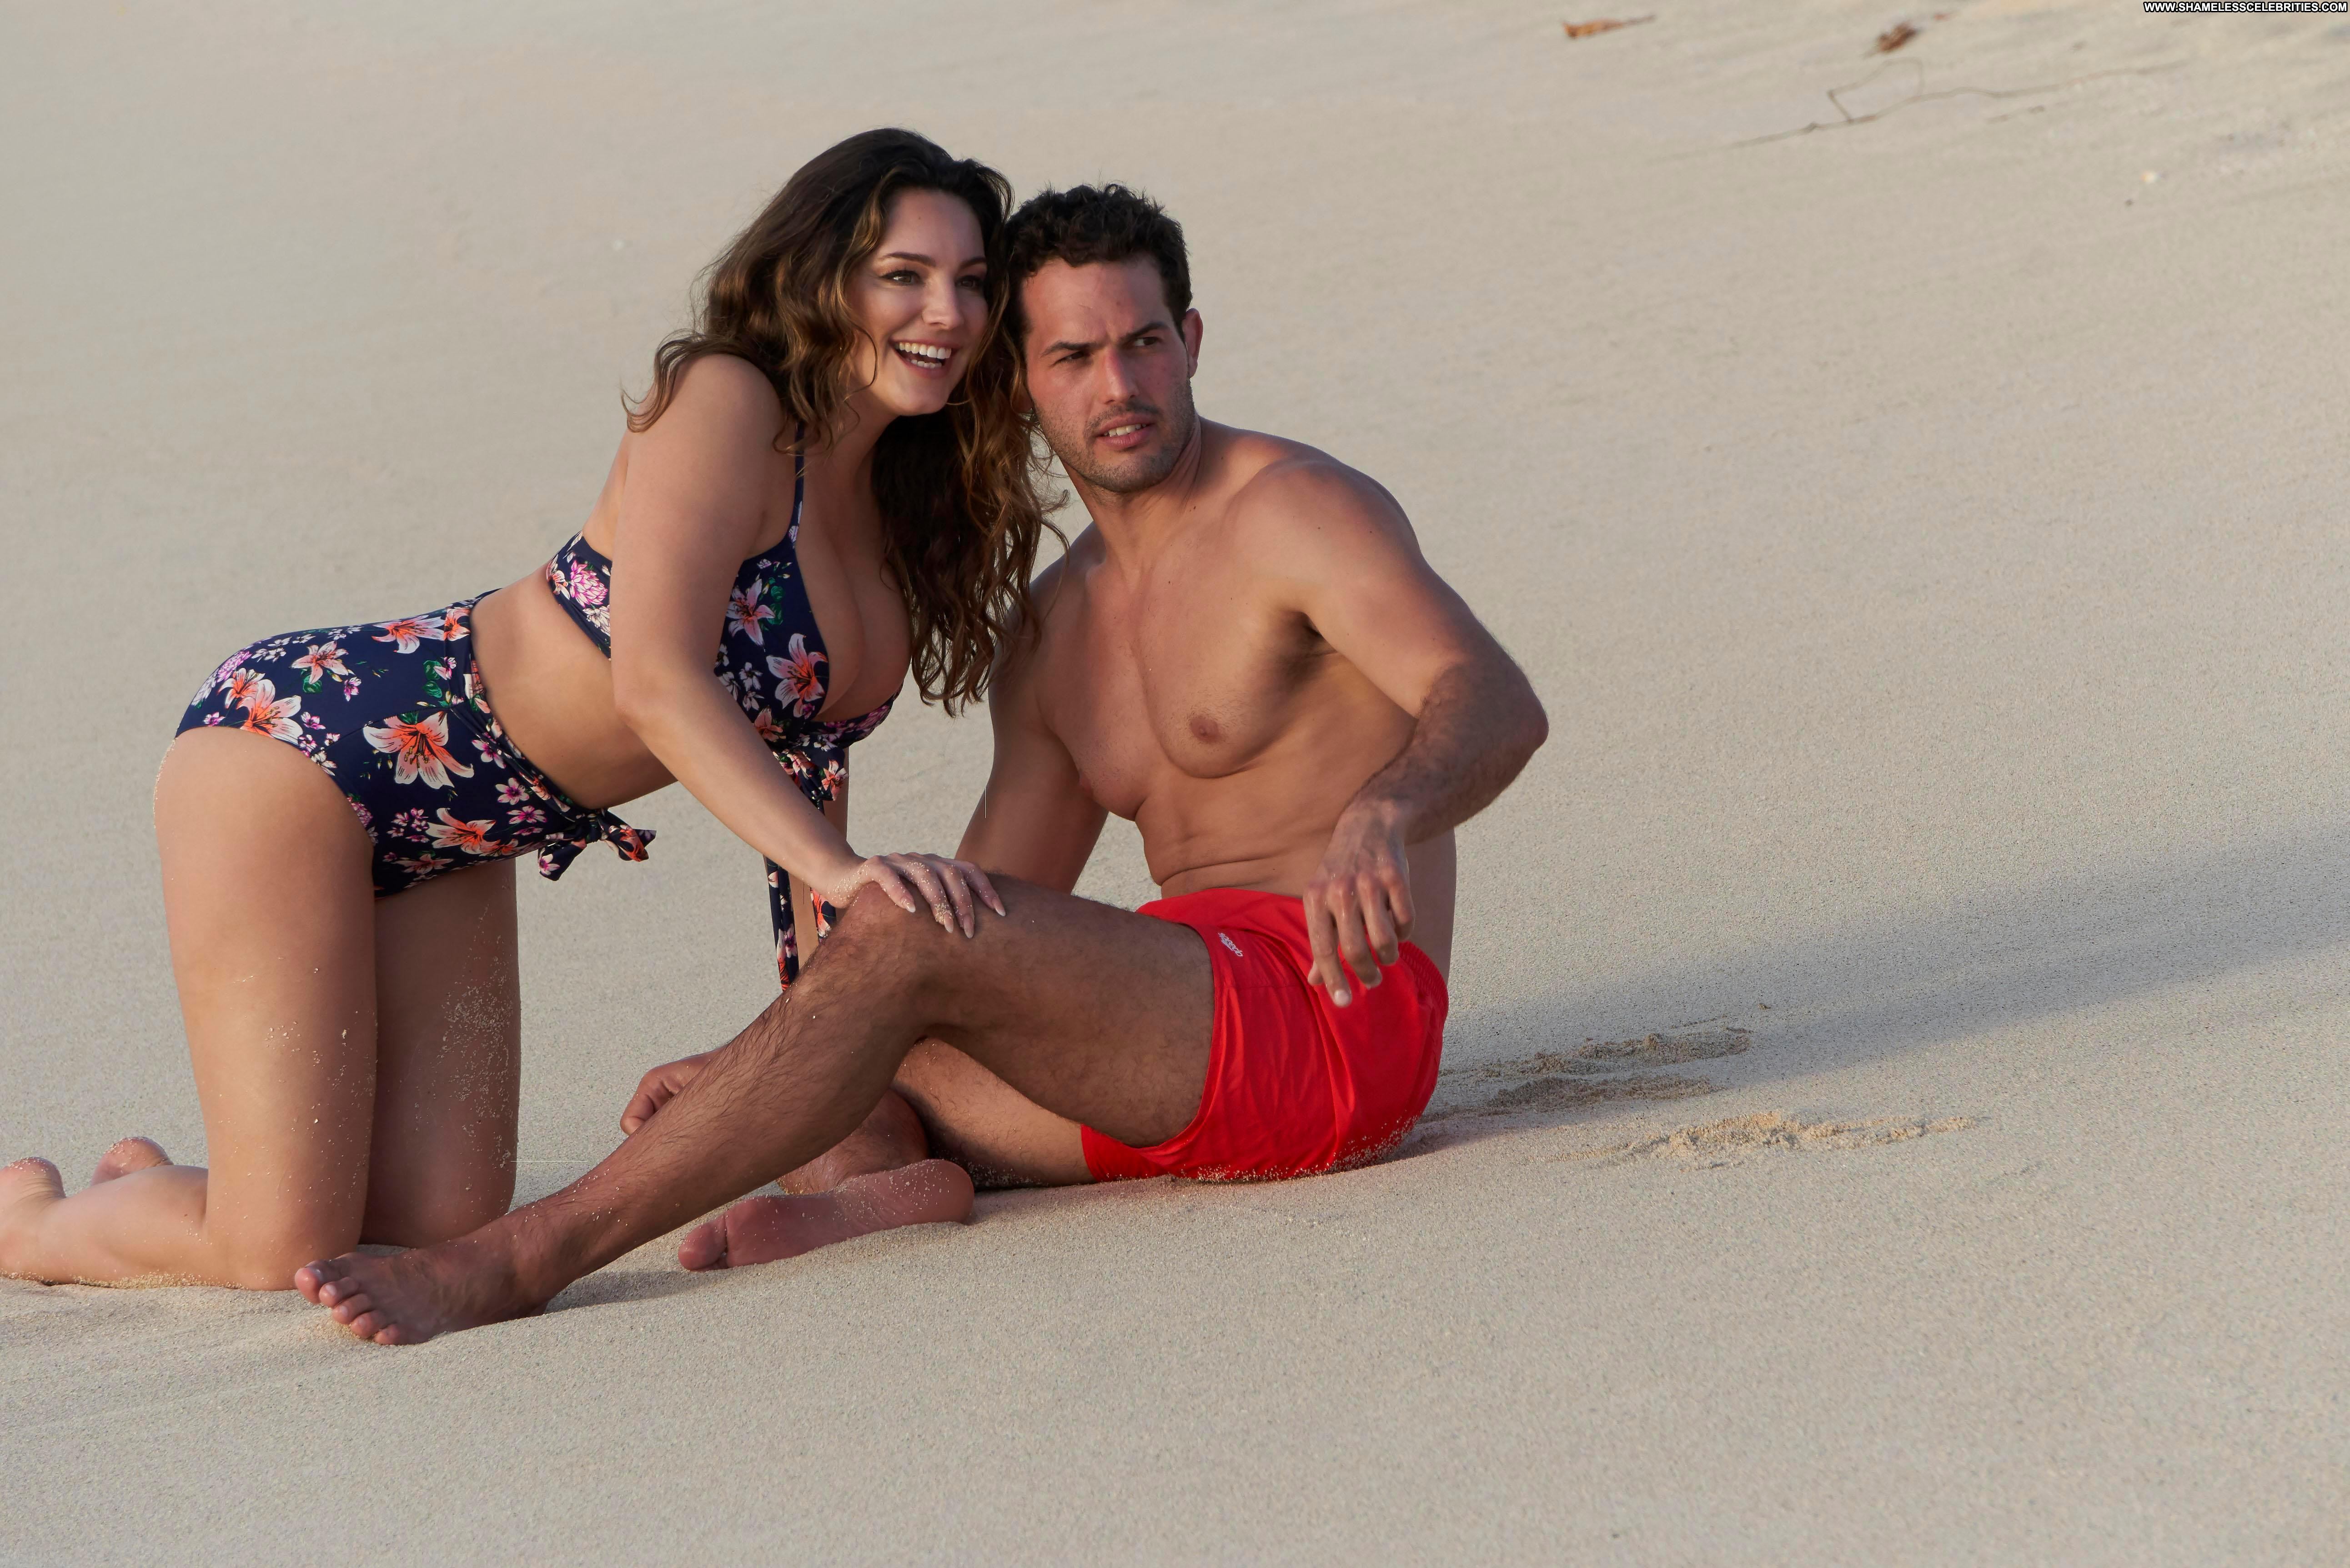 Forum on this topic: Lisa marie jaftha, yesjulz-in-bikini-at-a-beach-in/